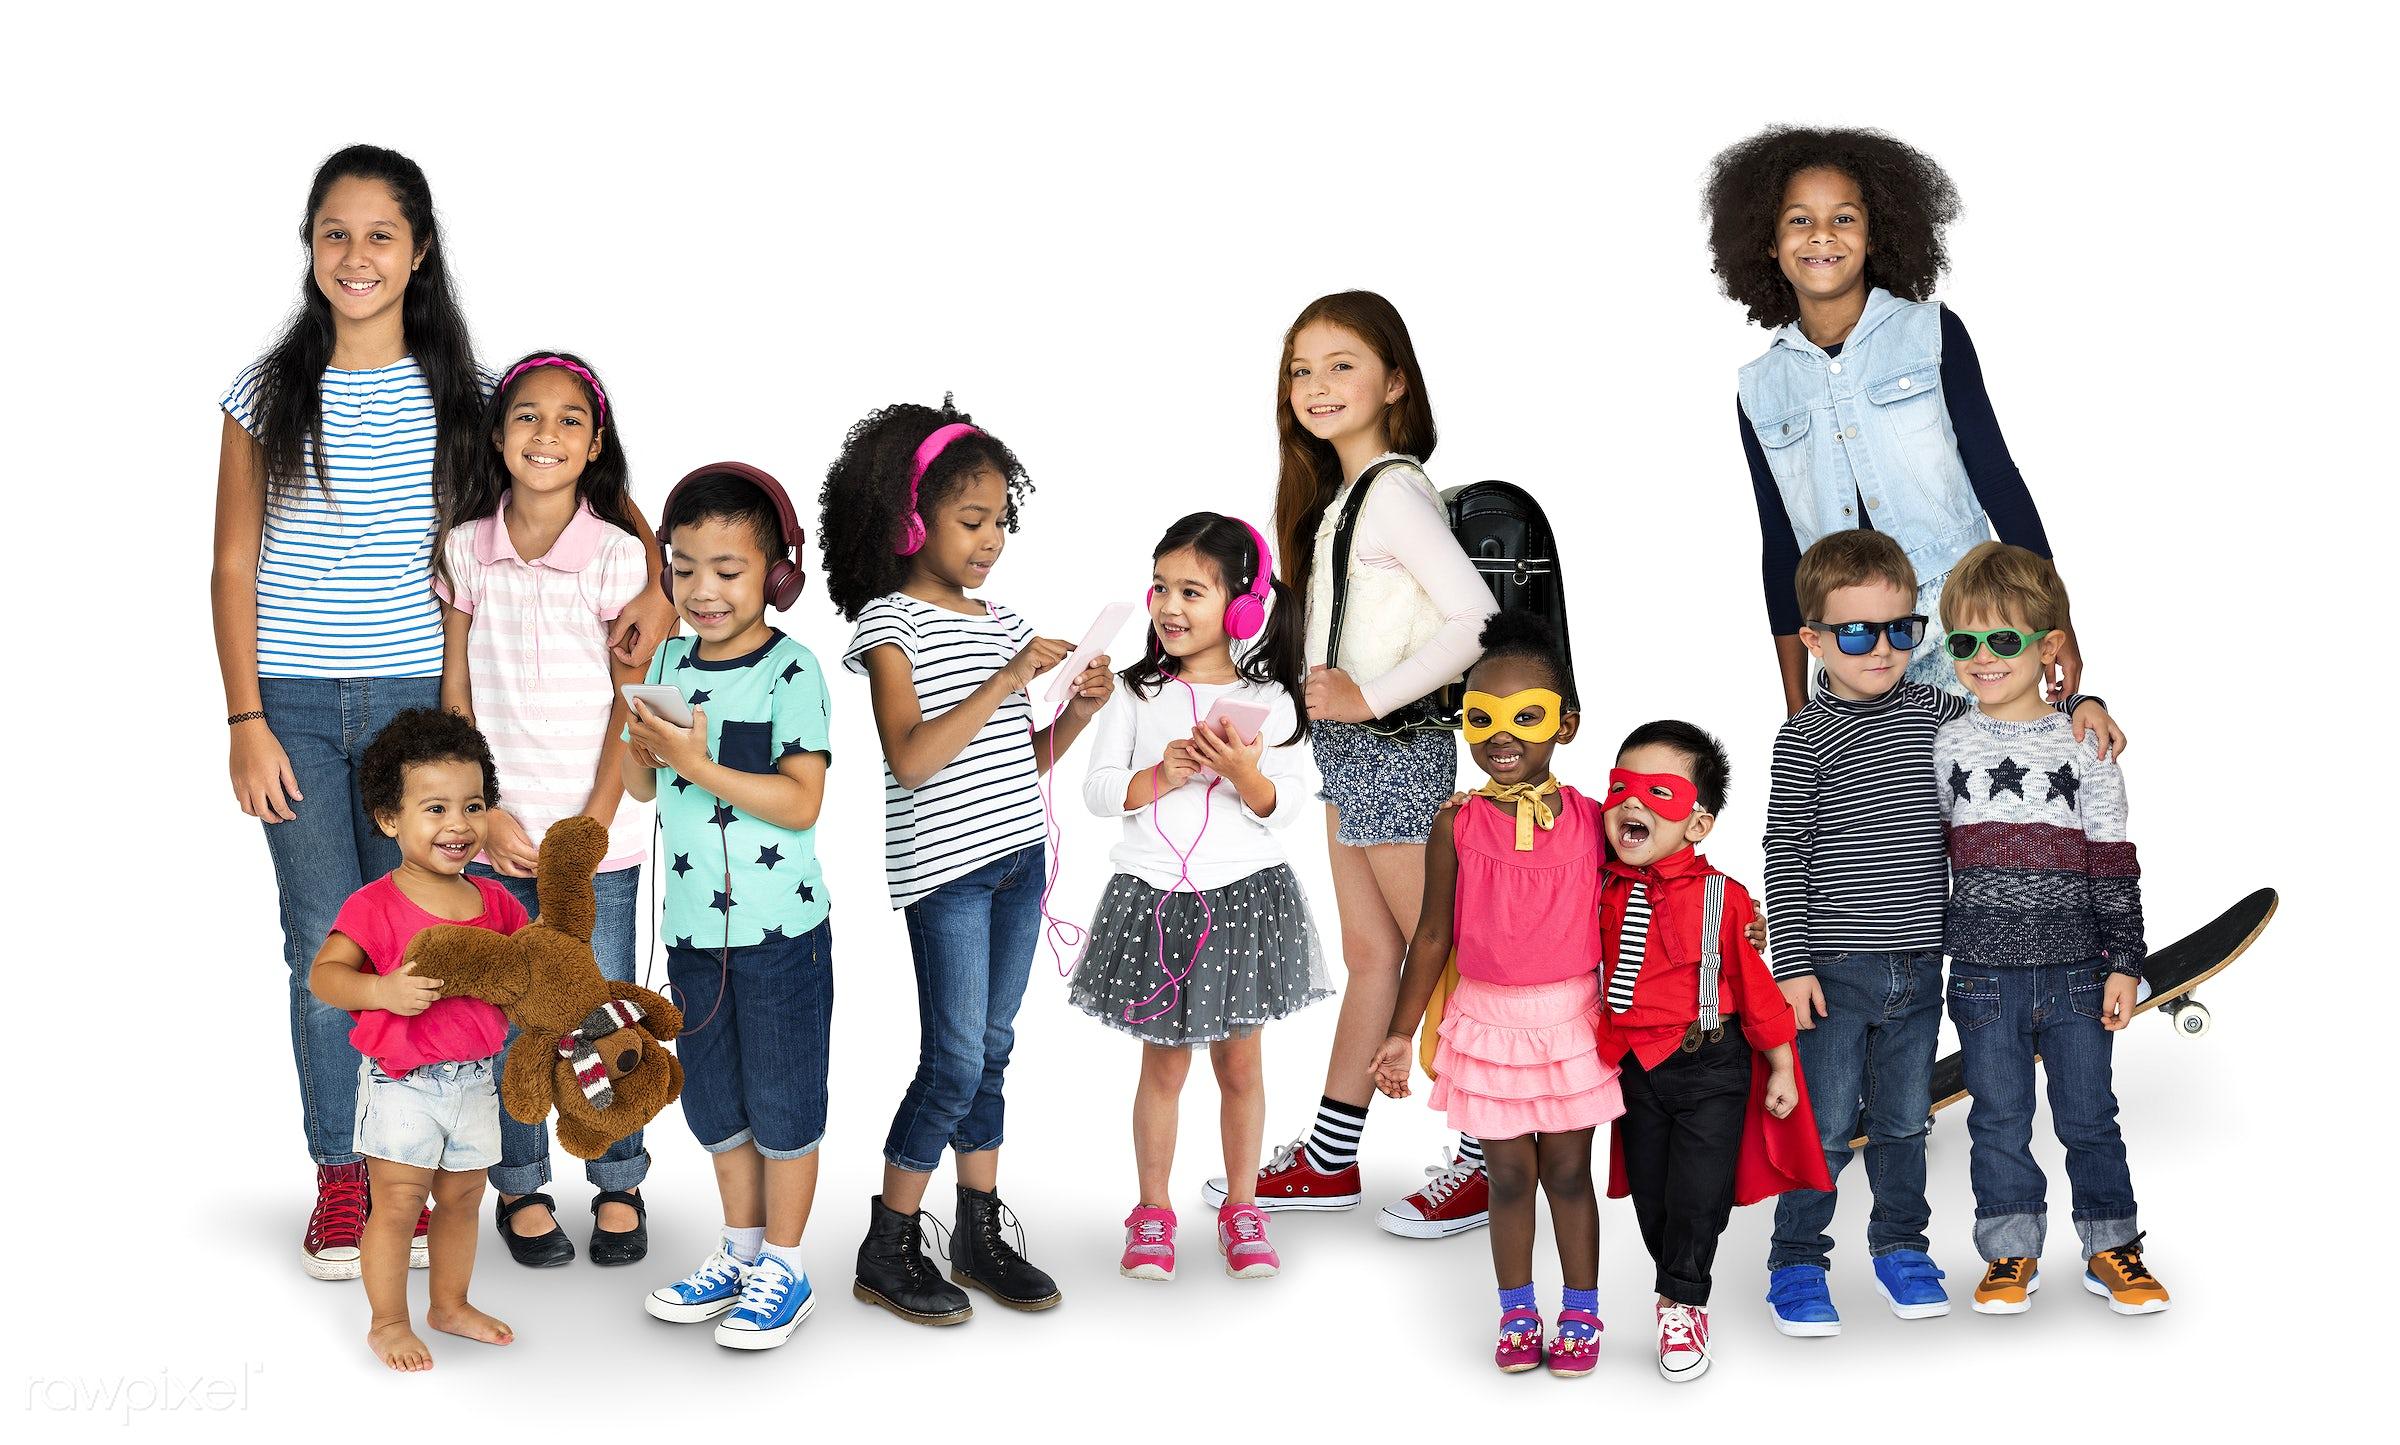 studio, person, diverse, innocent, little, recreation, people, asian, caucasian, little girls, teenager, lifestyle, studio...